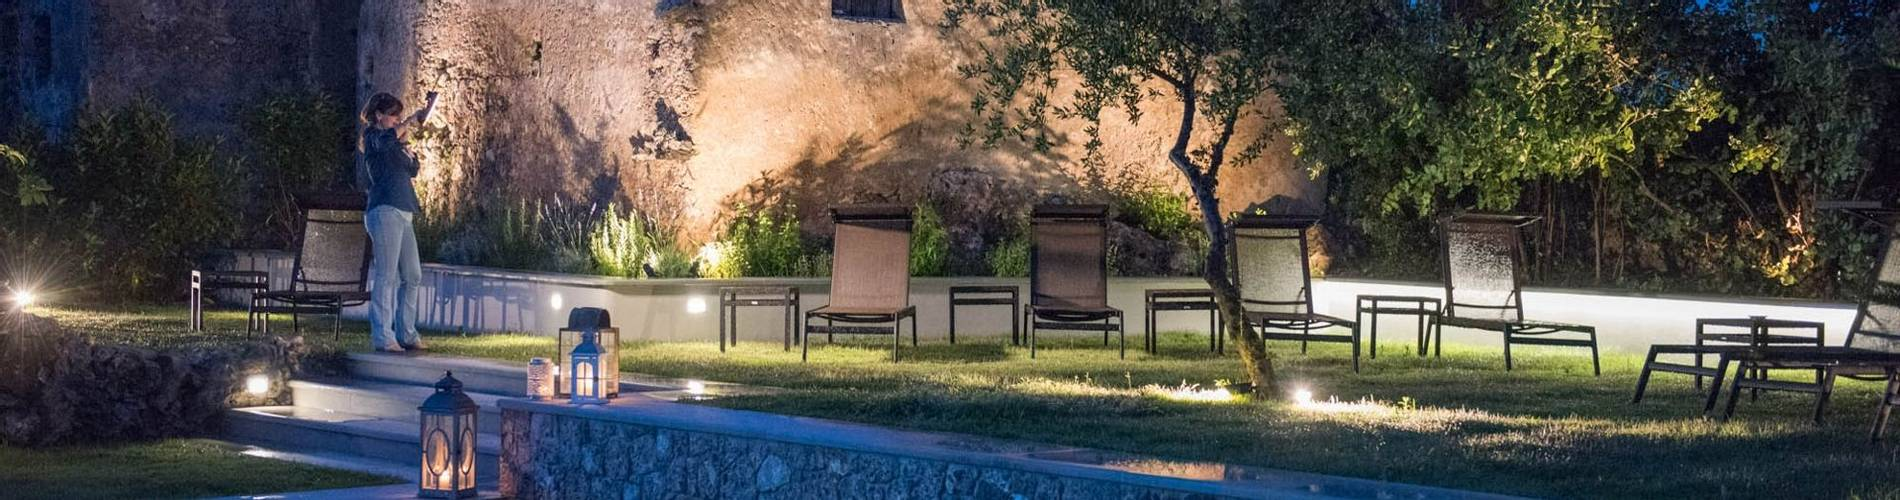 Villa Cheta, Basilicata, Italy (12).jpg